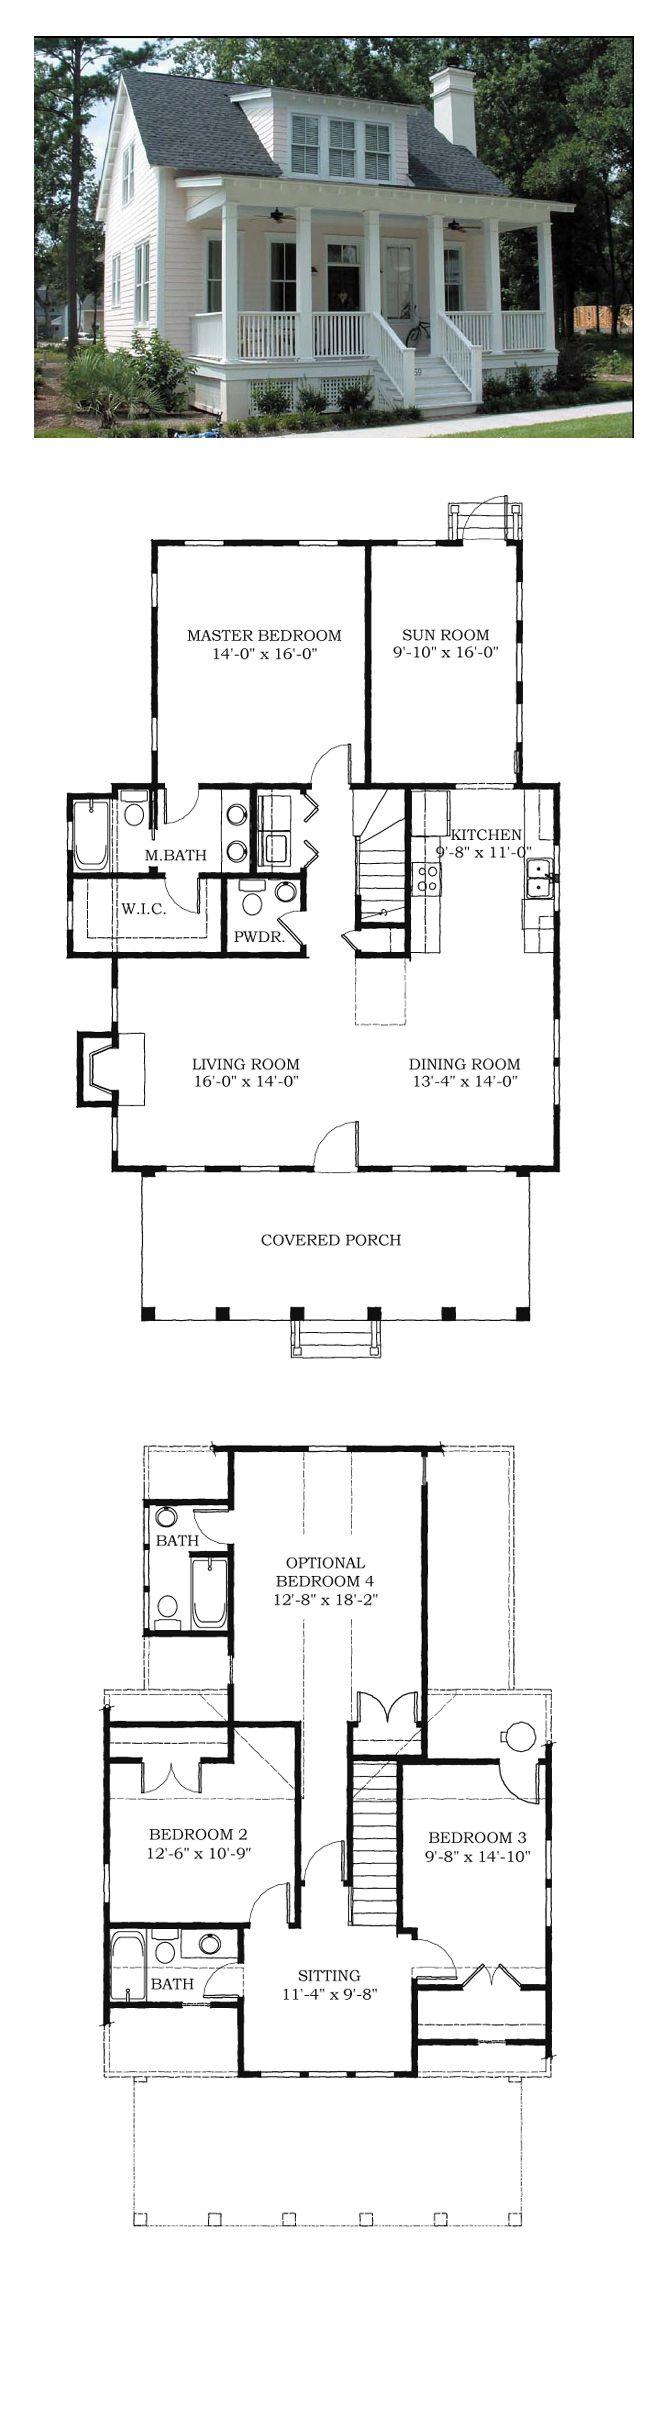 best floor plans for building a home images on pinterest